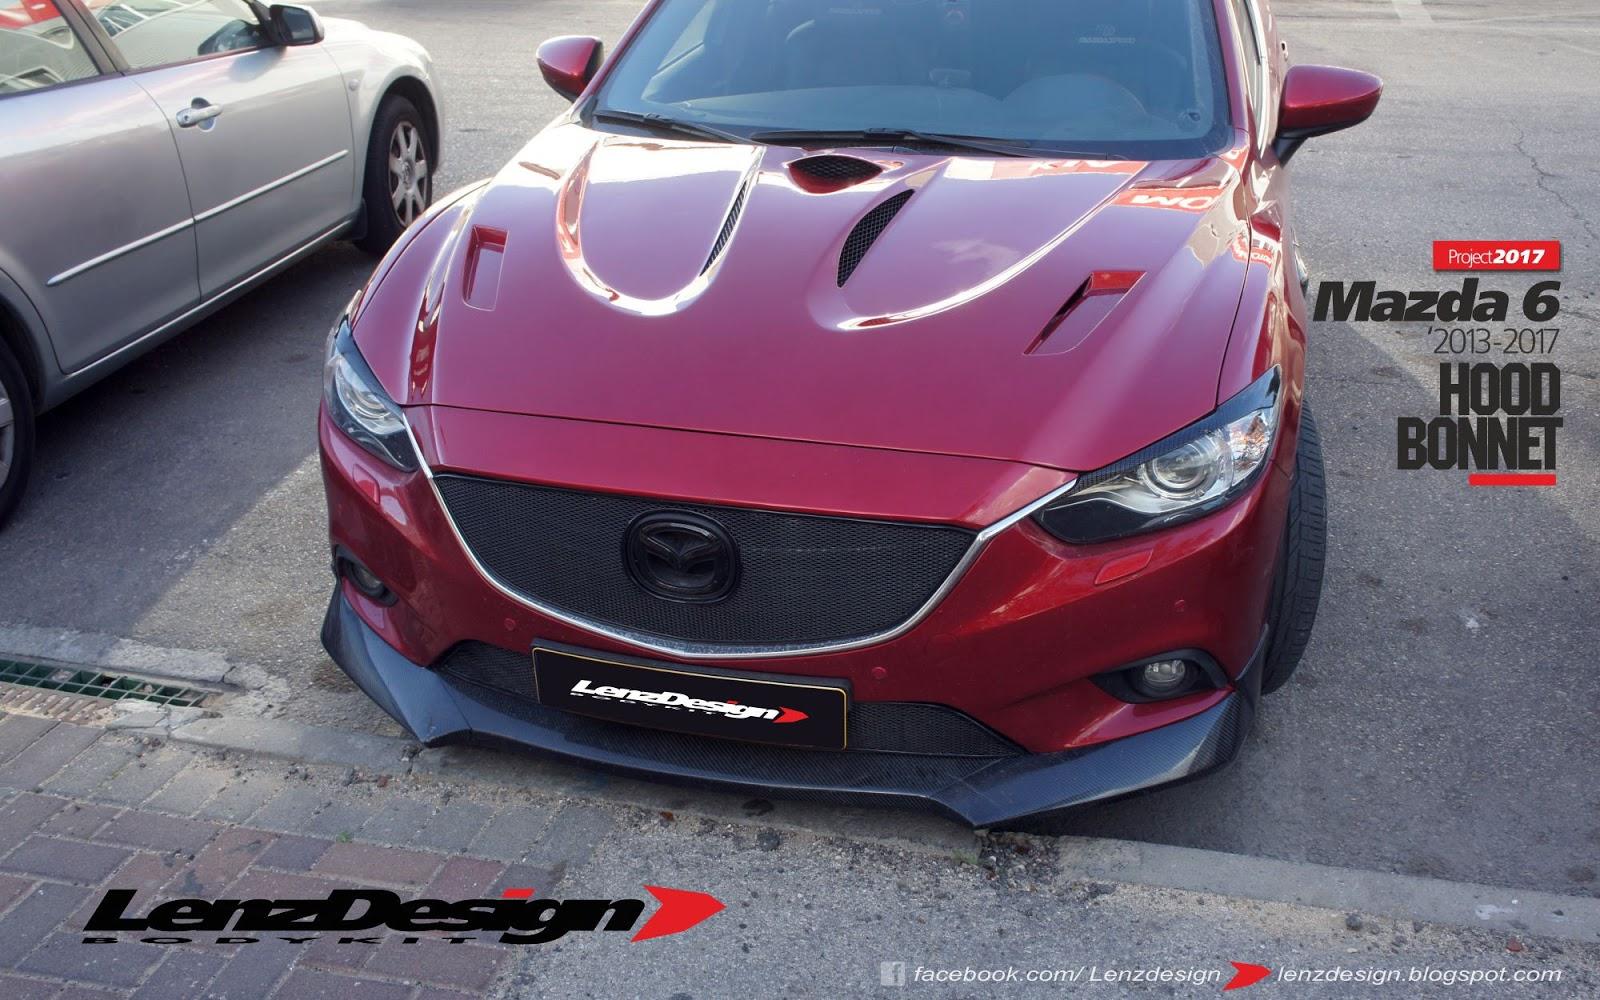 Mazda Mazda6: Hood